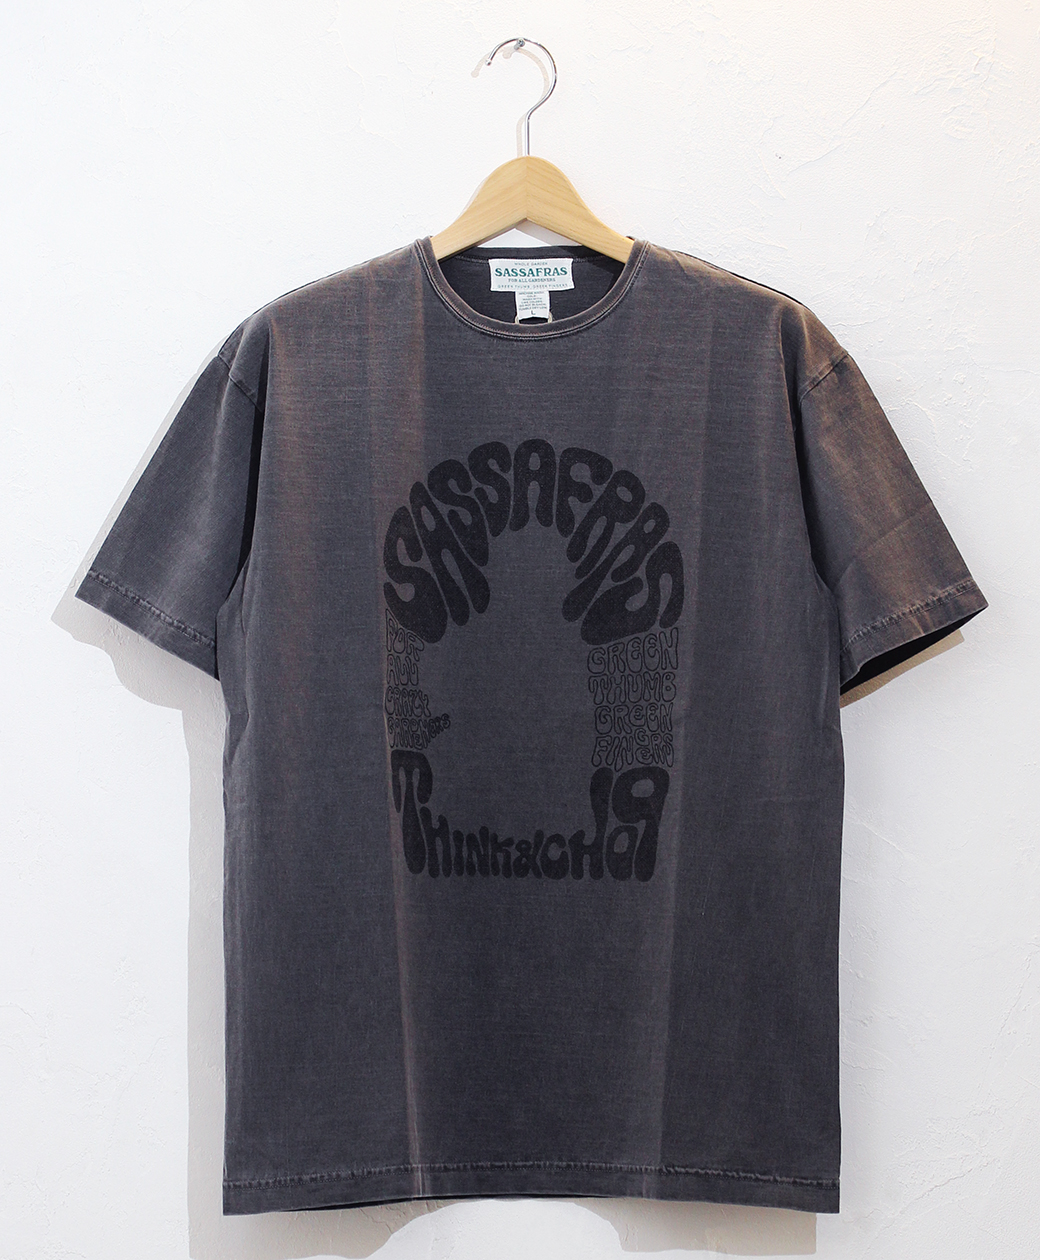 SASSAFRAS T&C Unsccooppam T(Black Pigment)